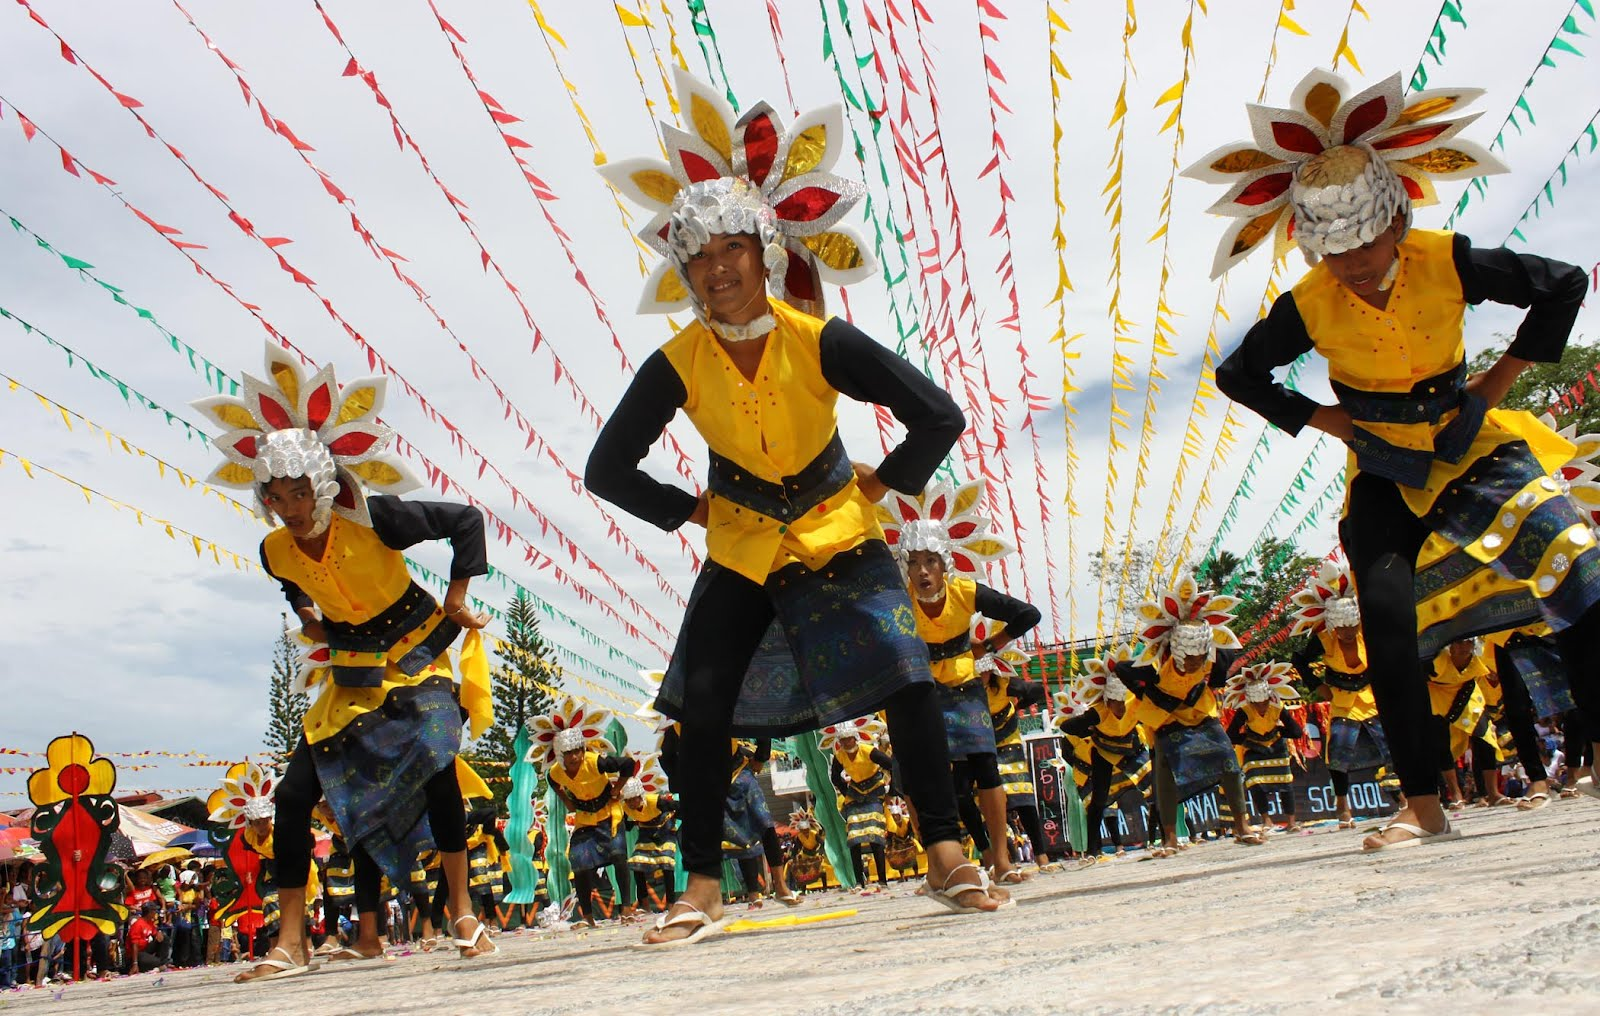 saranggani festival Official website of the sarangani province, mindanao, philippines.